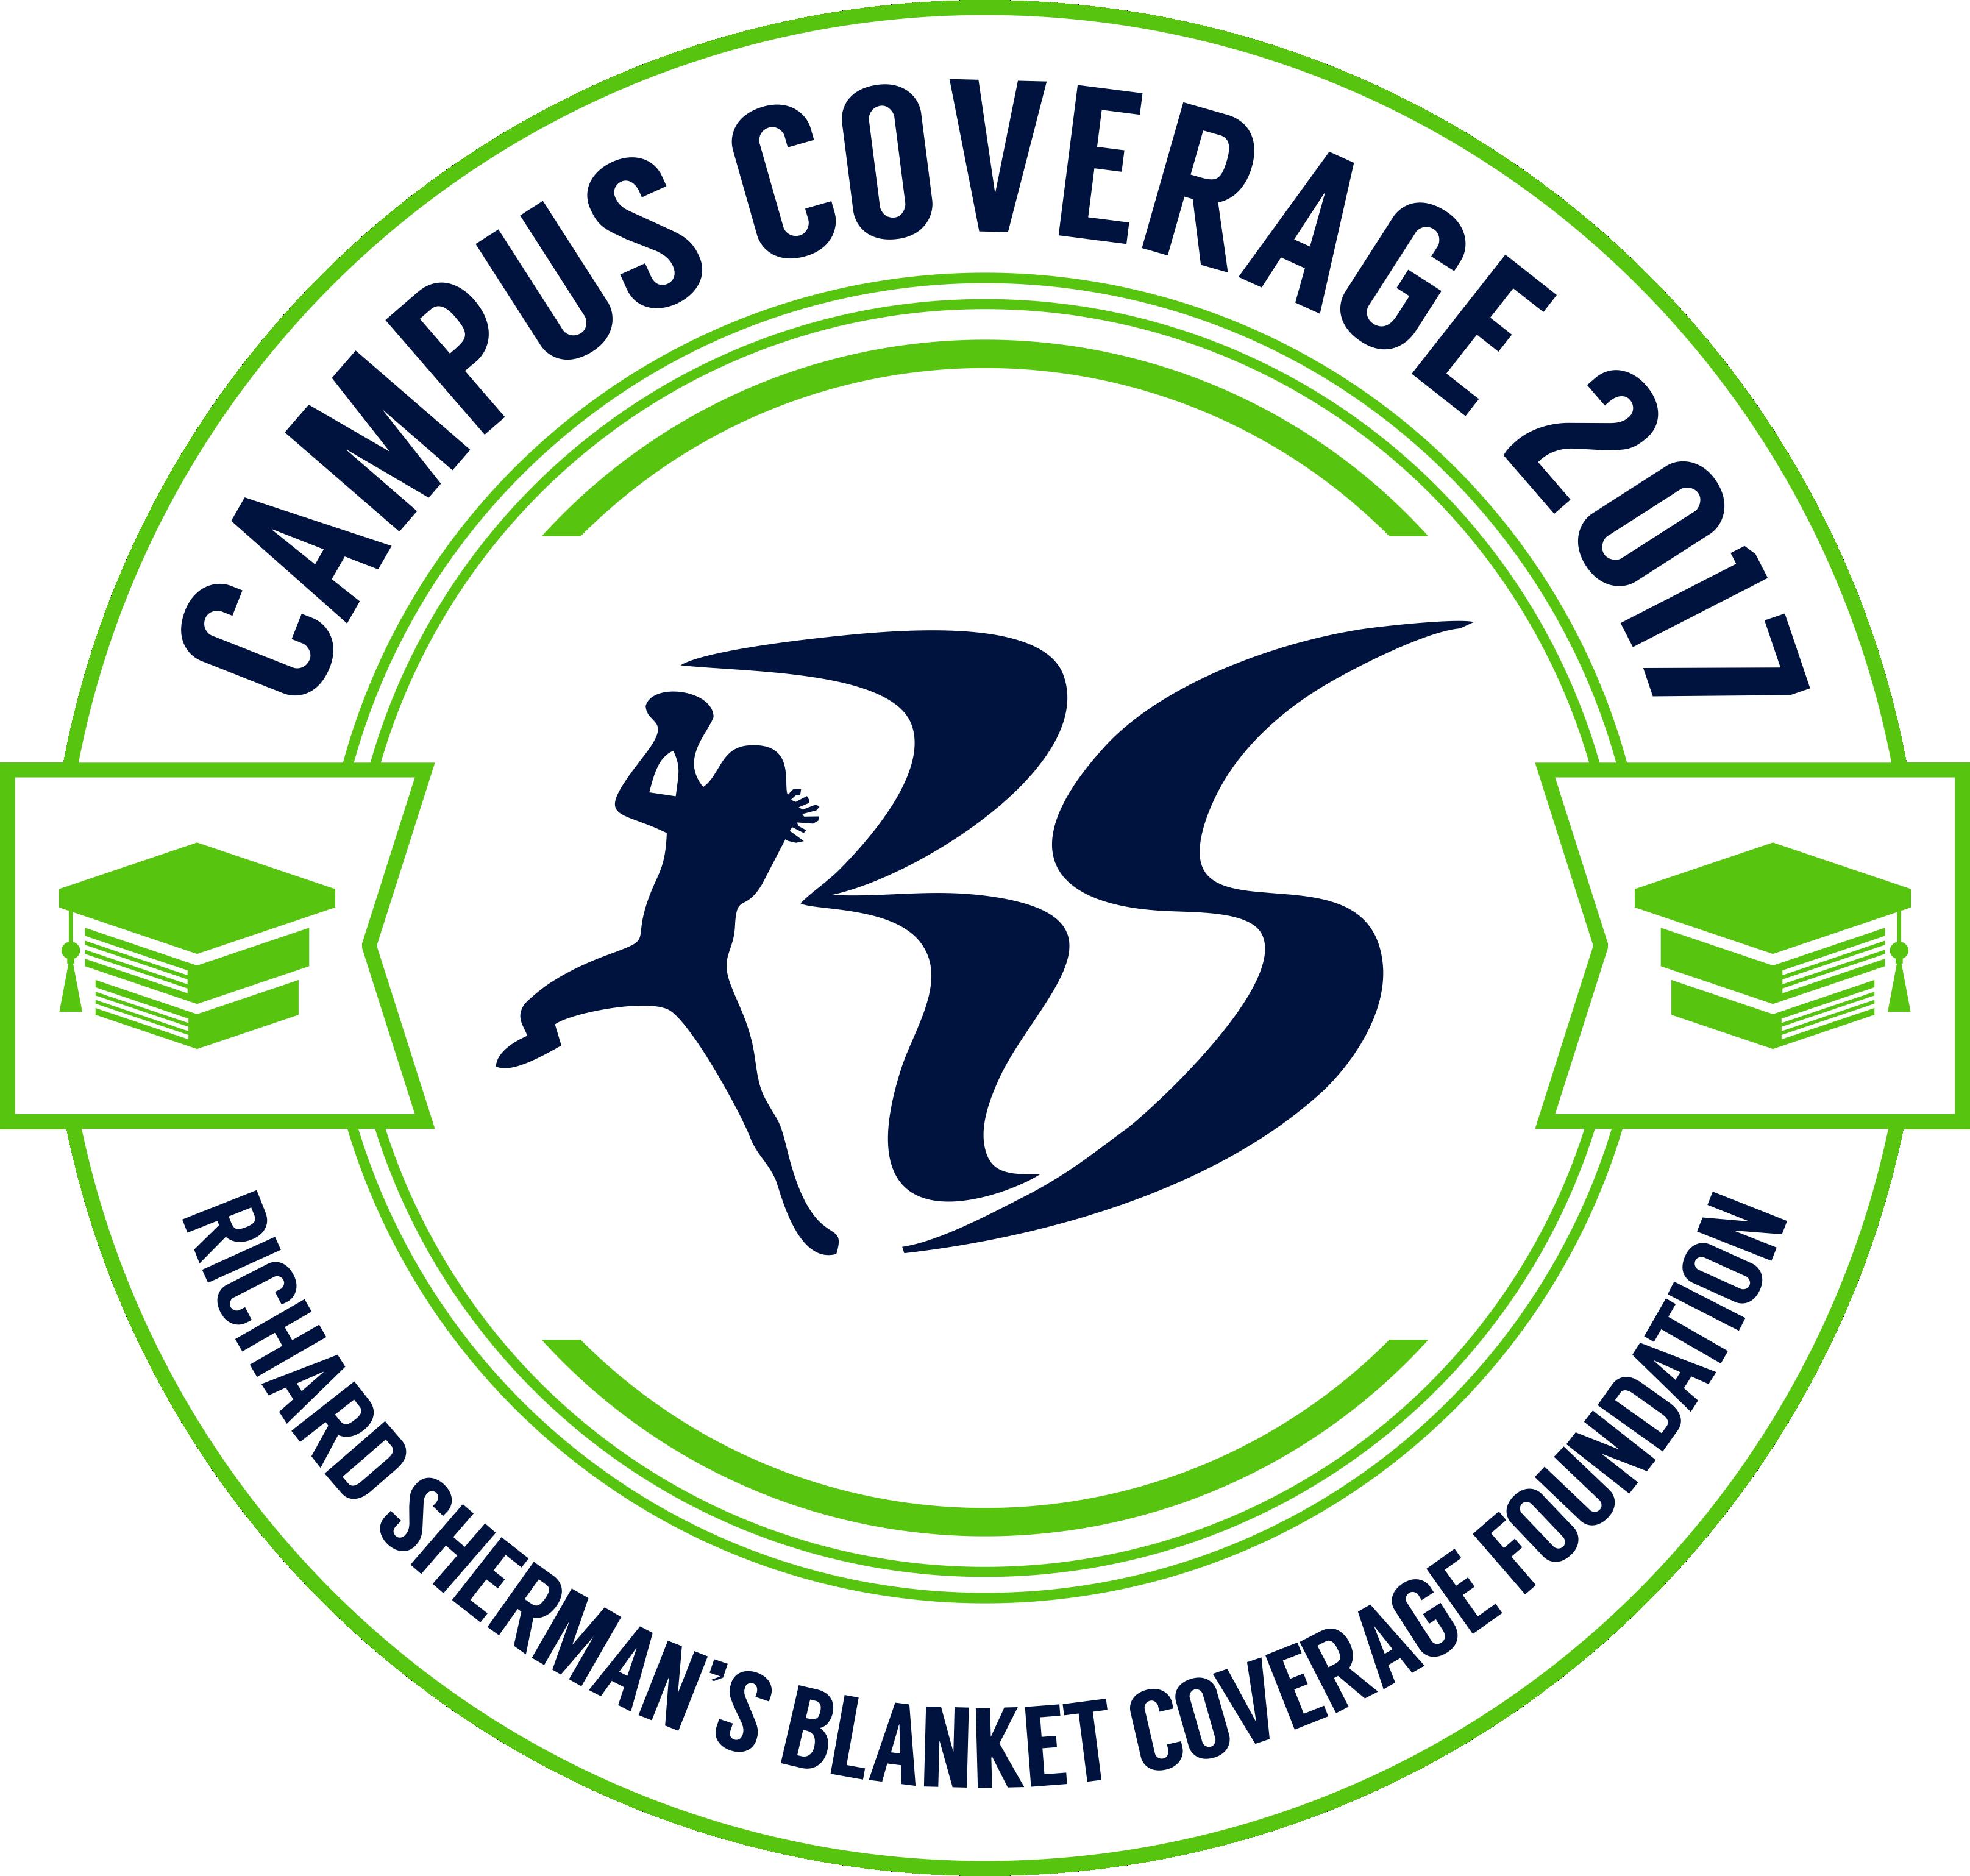 Richard Sherman (of the Seattle Seahawks!) Blanket Coverage Foundation Logo